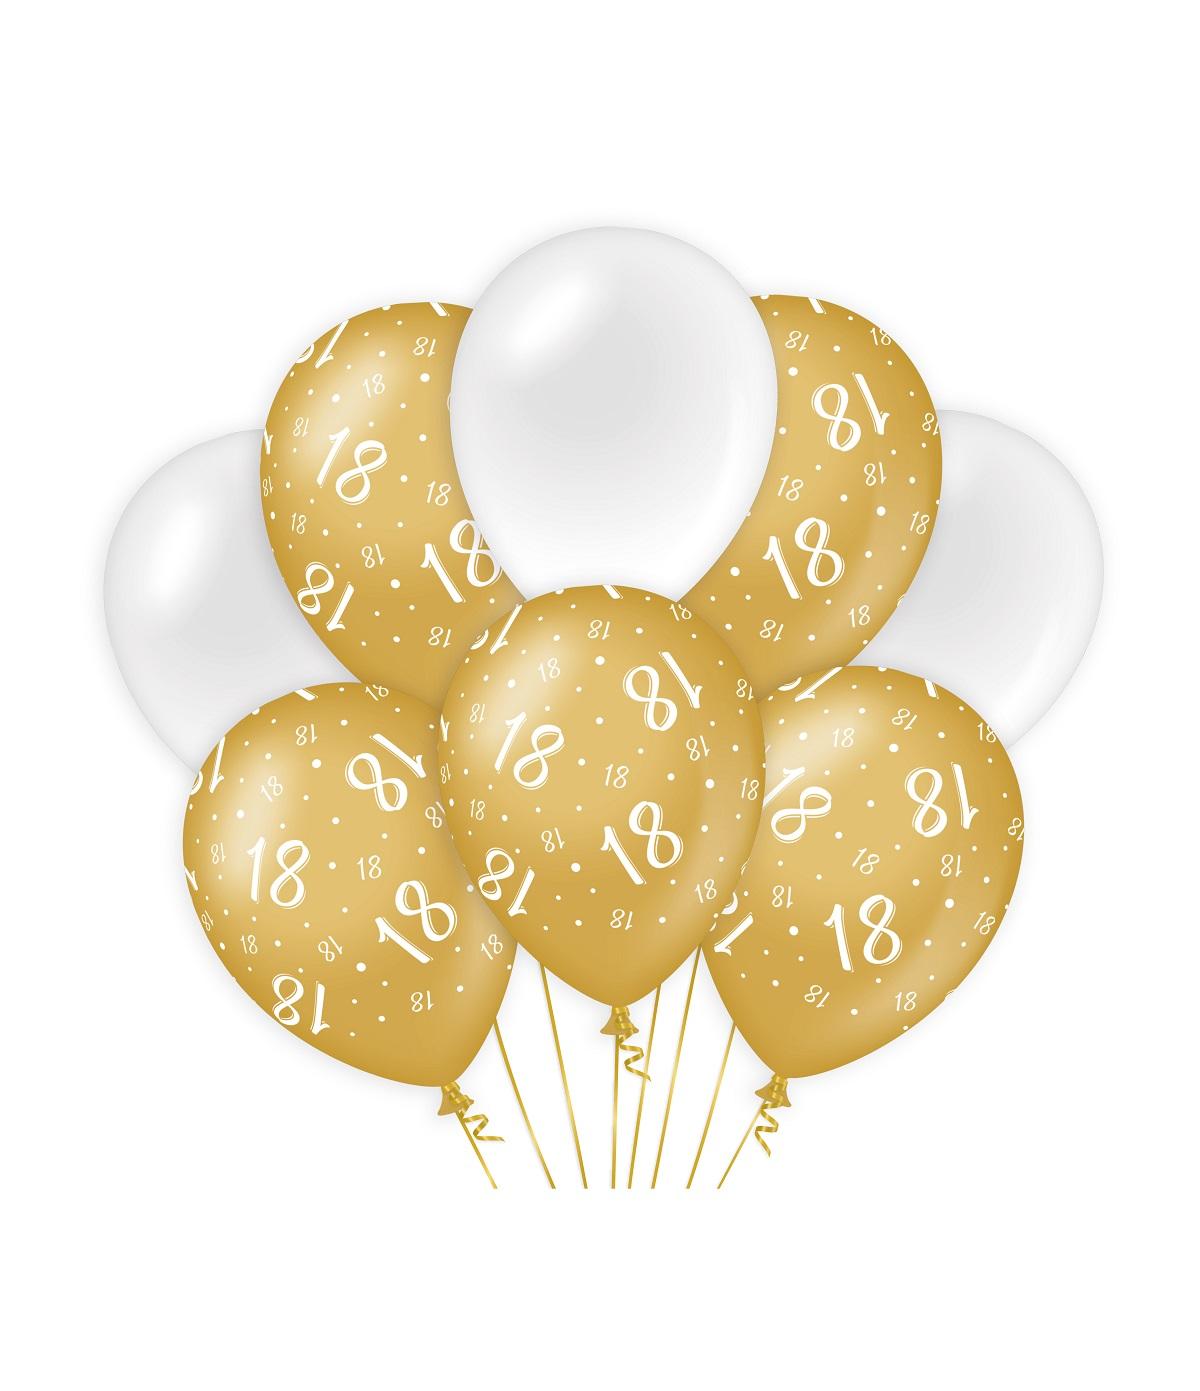 "8st Ballonnen 18 Jaar Goud/Wit 12"""